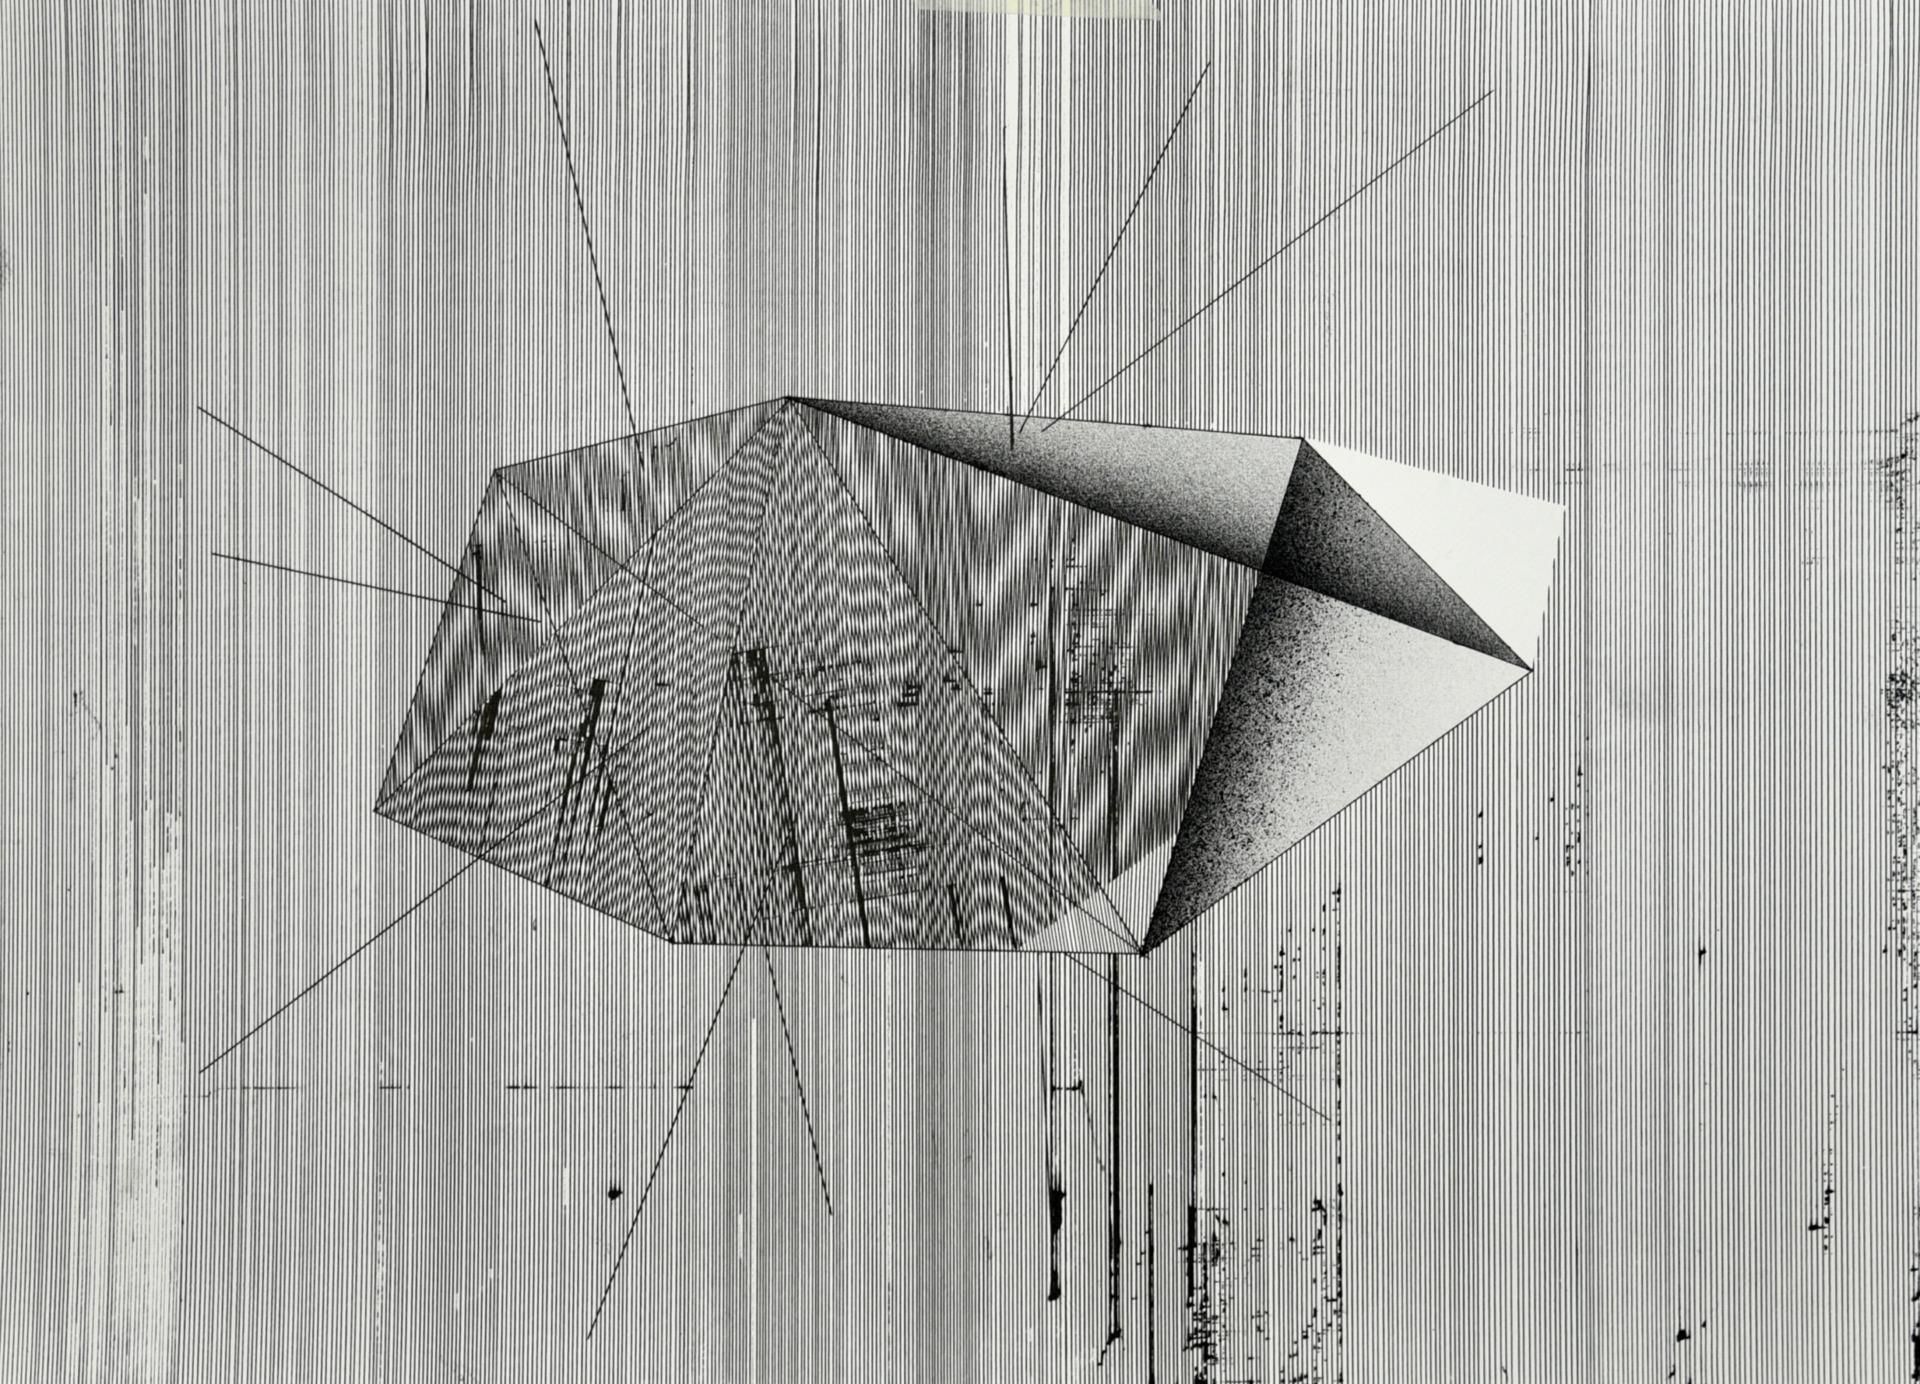 Contemporary art from Gyula Sági | Op.161220. 4